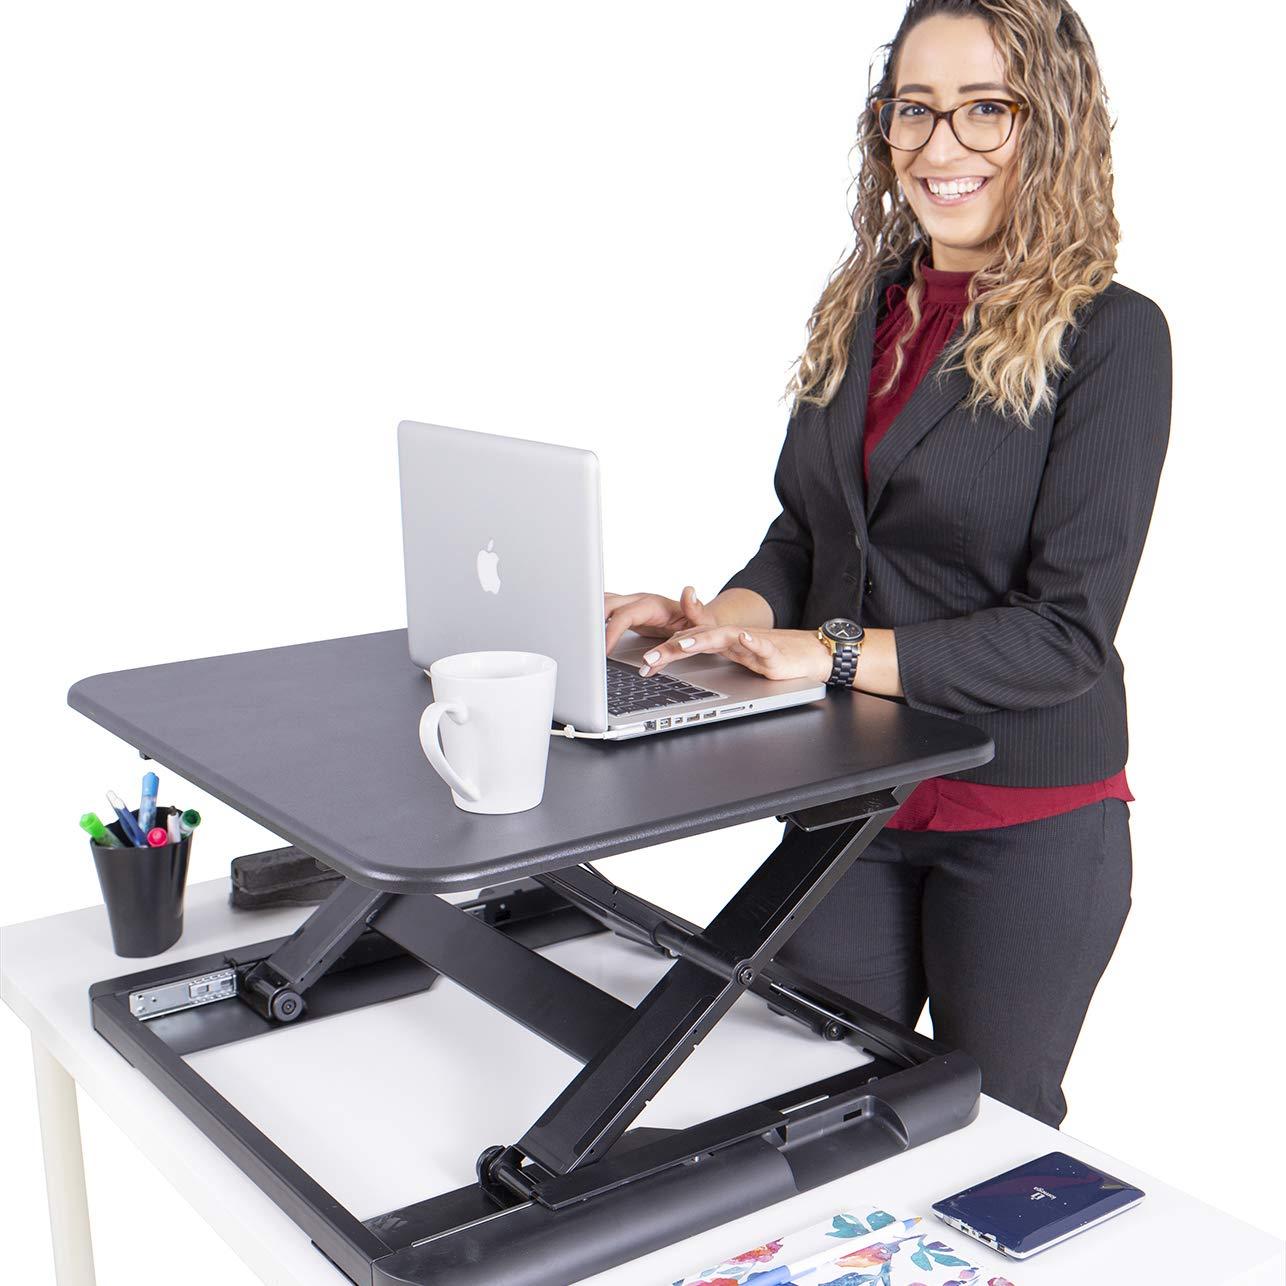 TOTALPACK Standing Desk Sit Stand Desk Converter - Anti Fatigue Height Adjustable Workstation, Extra Large 26.5'' x 22.2'' Desktop Surface, Easy to Raise & Lower - Pre-Assembled, Black